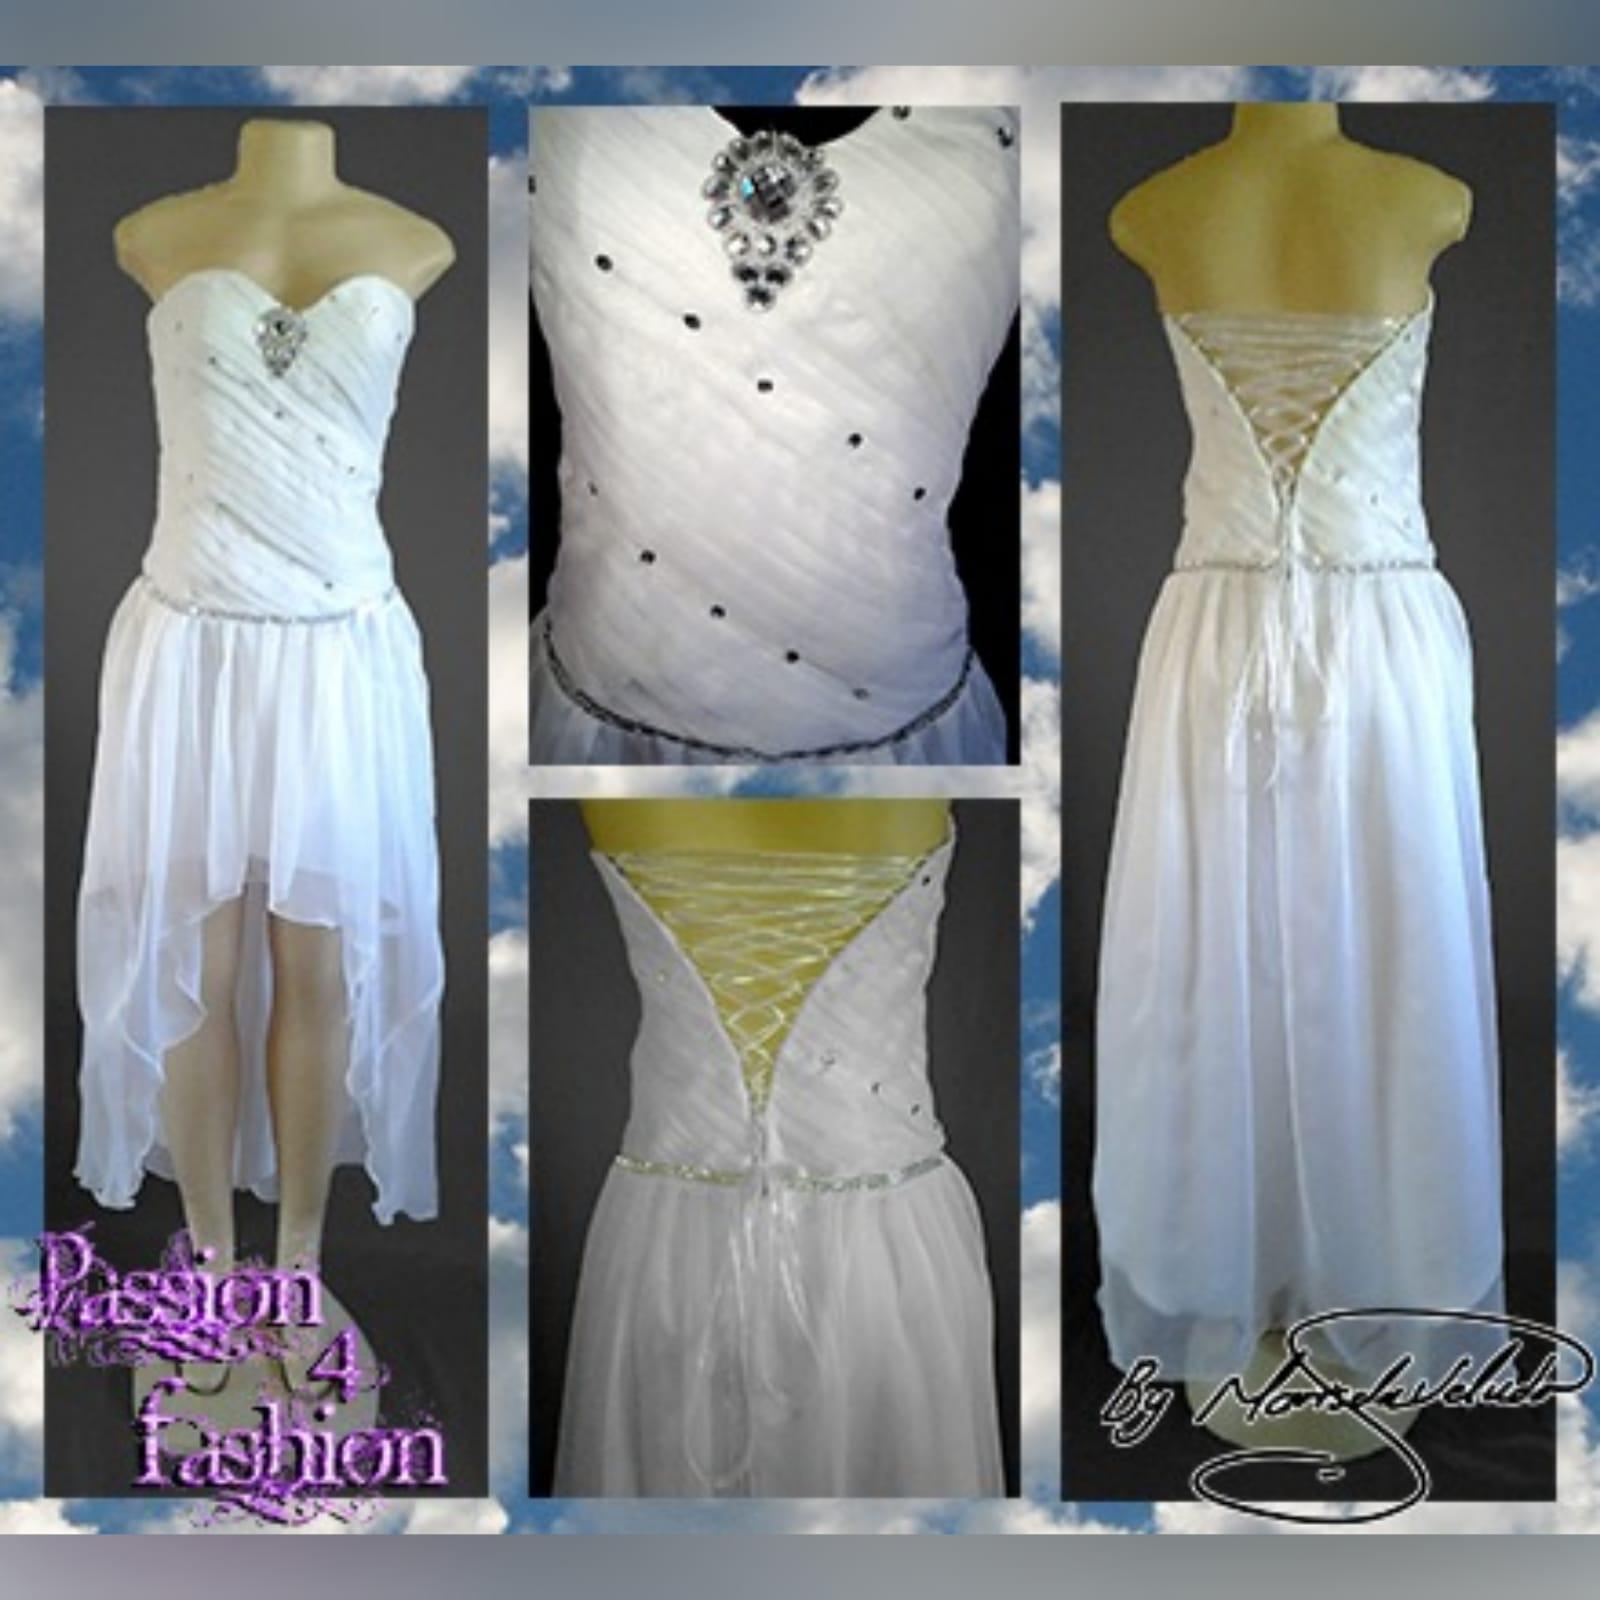 Hi-lo pleated bodice white wedding dress 4 hi-lo white chiffon wedding dress with a full pleated bodice. This wedding dress has a lace up back and silver finishes.